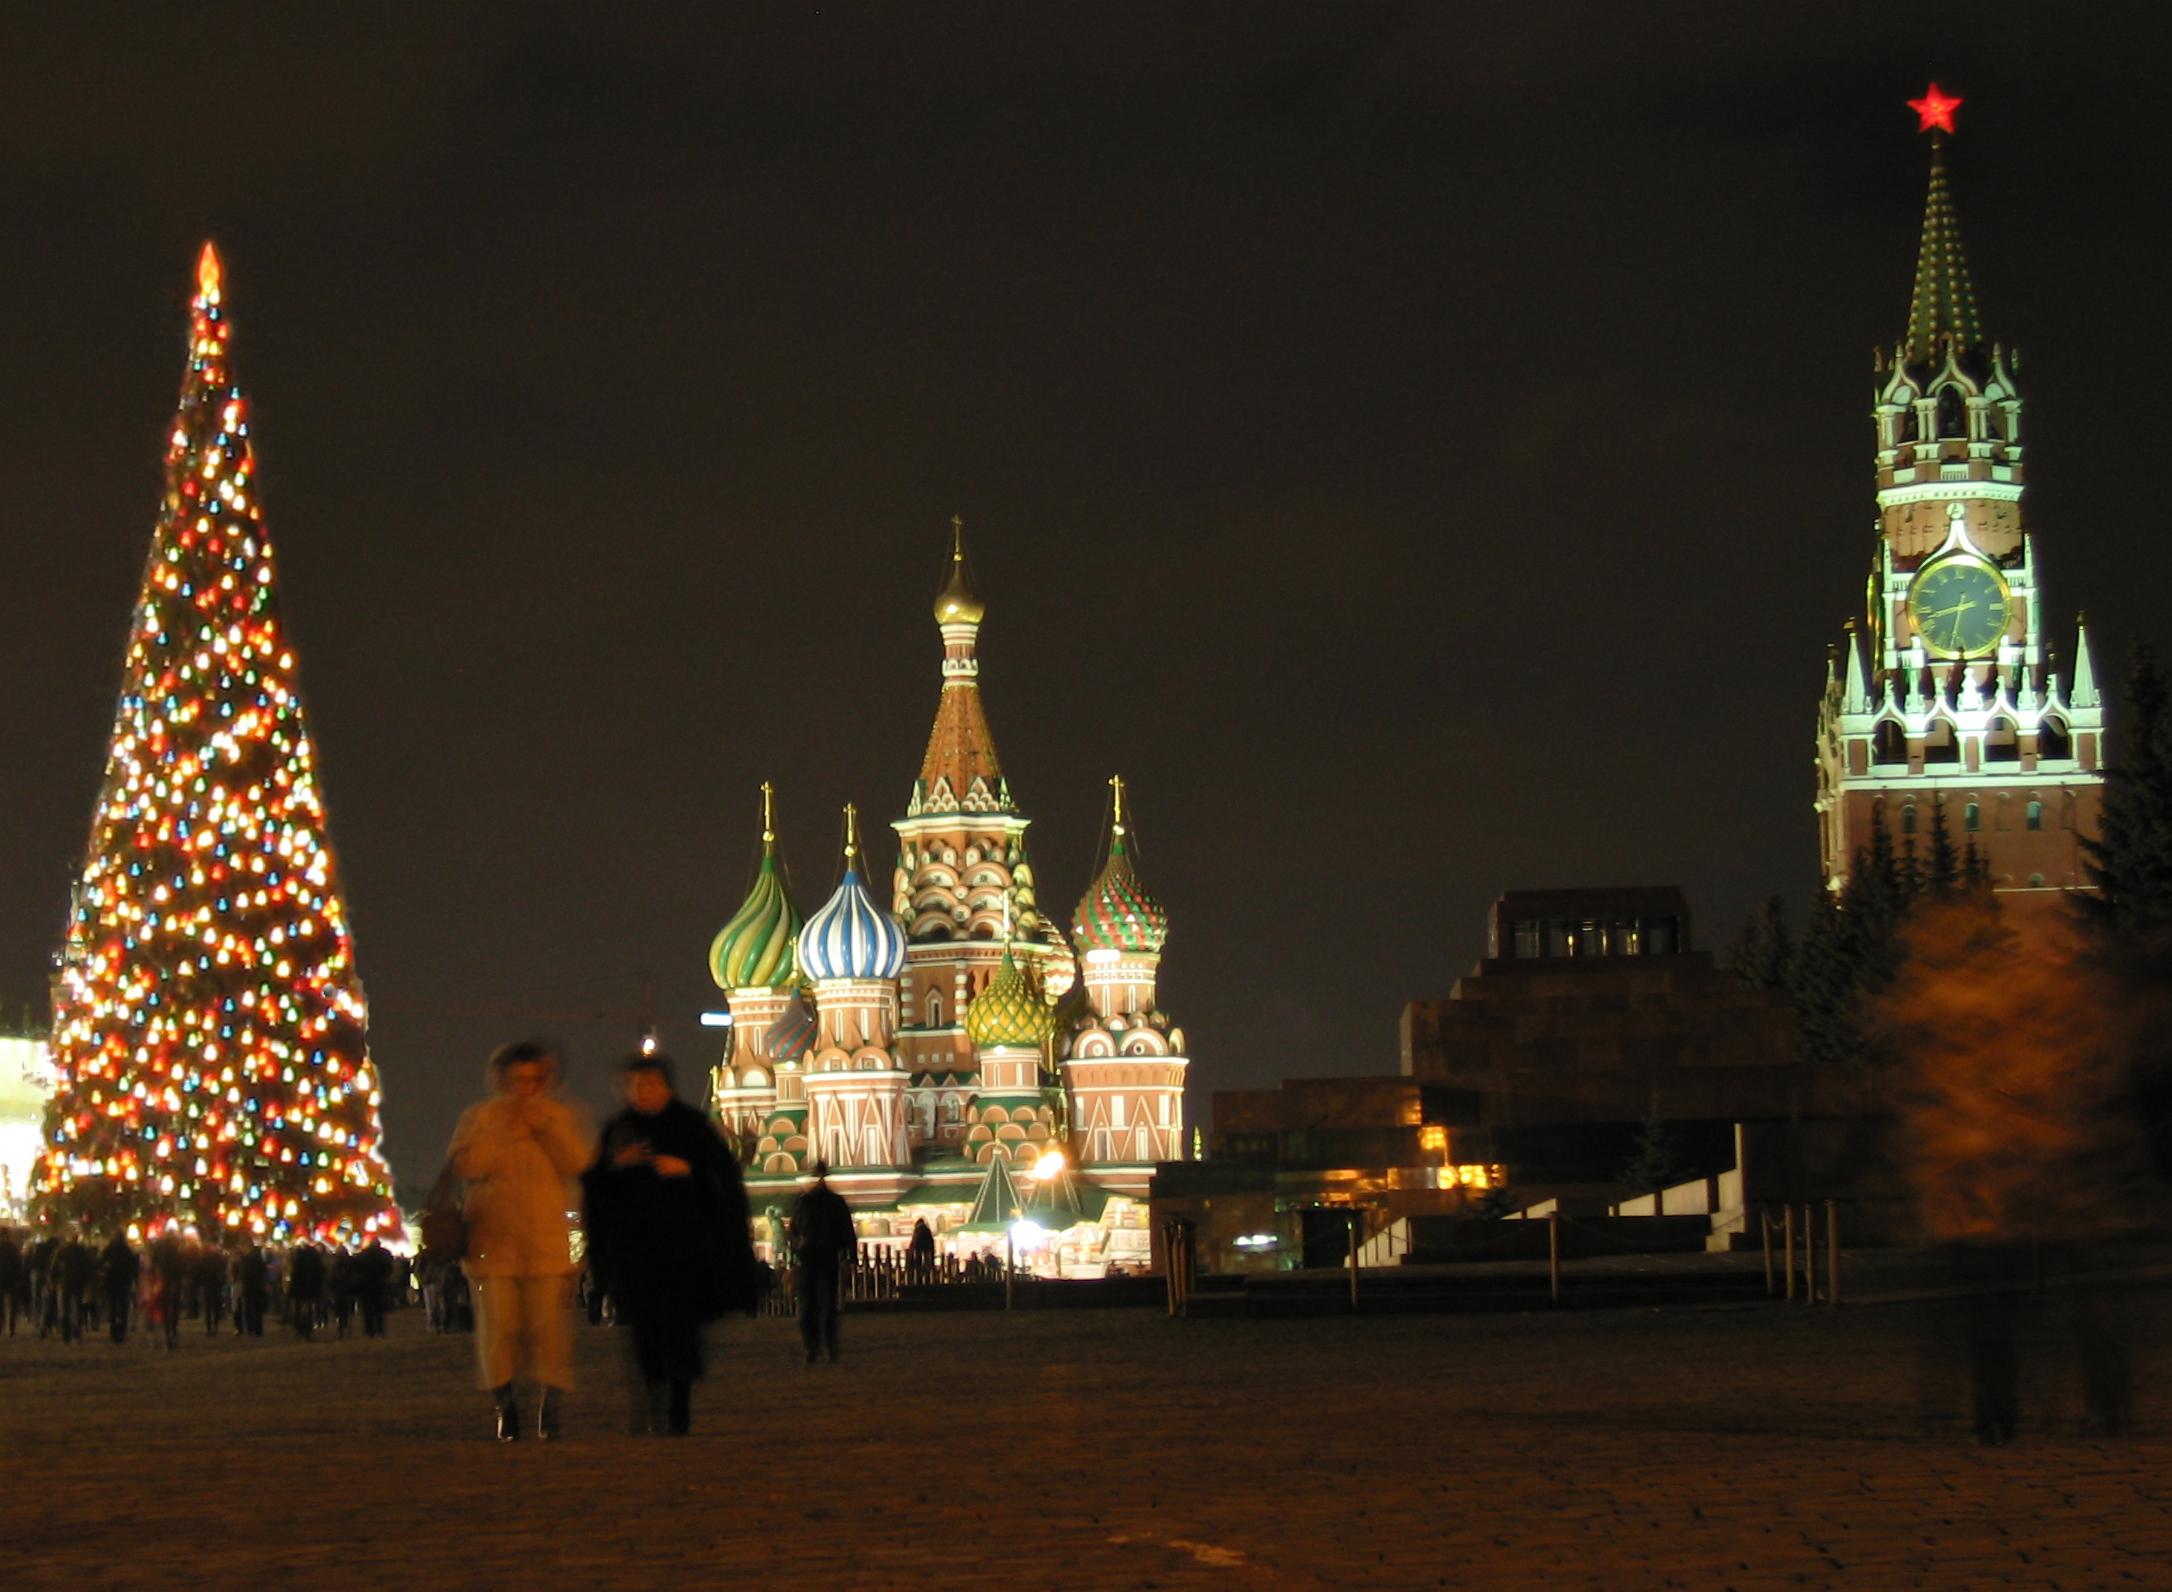 http://45eq7vmb9bj1ratu11zv1p19.wpengine.netdna-cdn.com/wp-content/uploads/2017/01/christmas-moscow.jpg